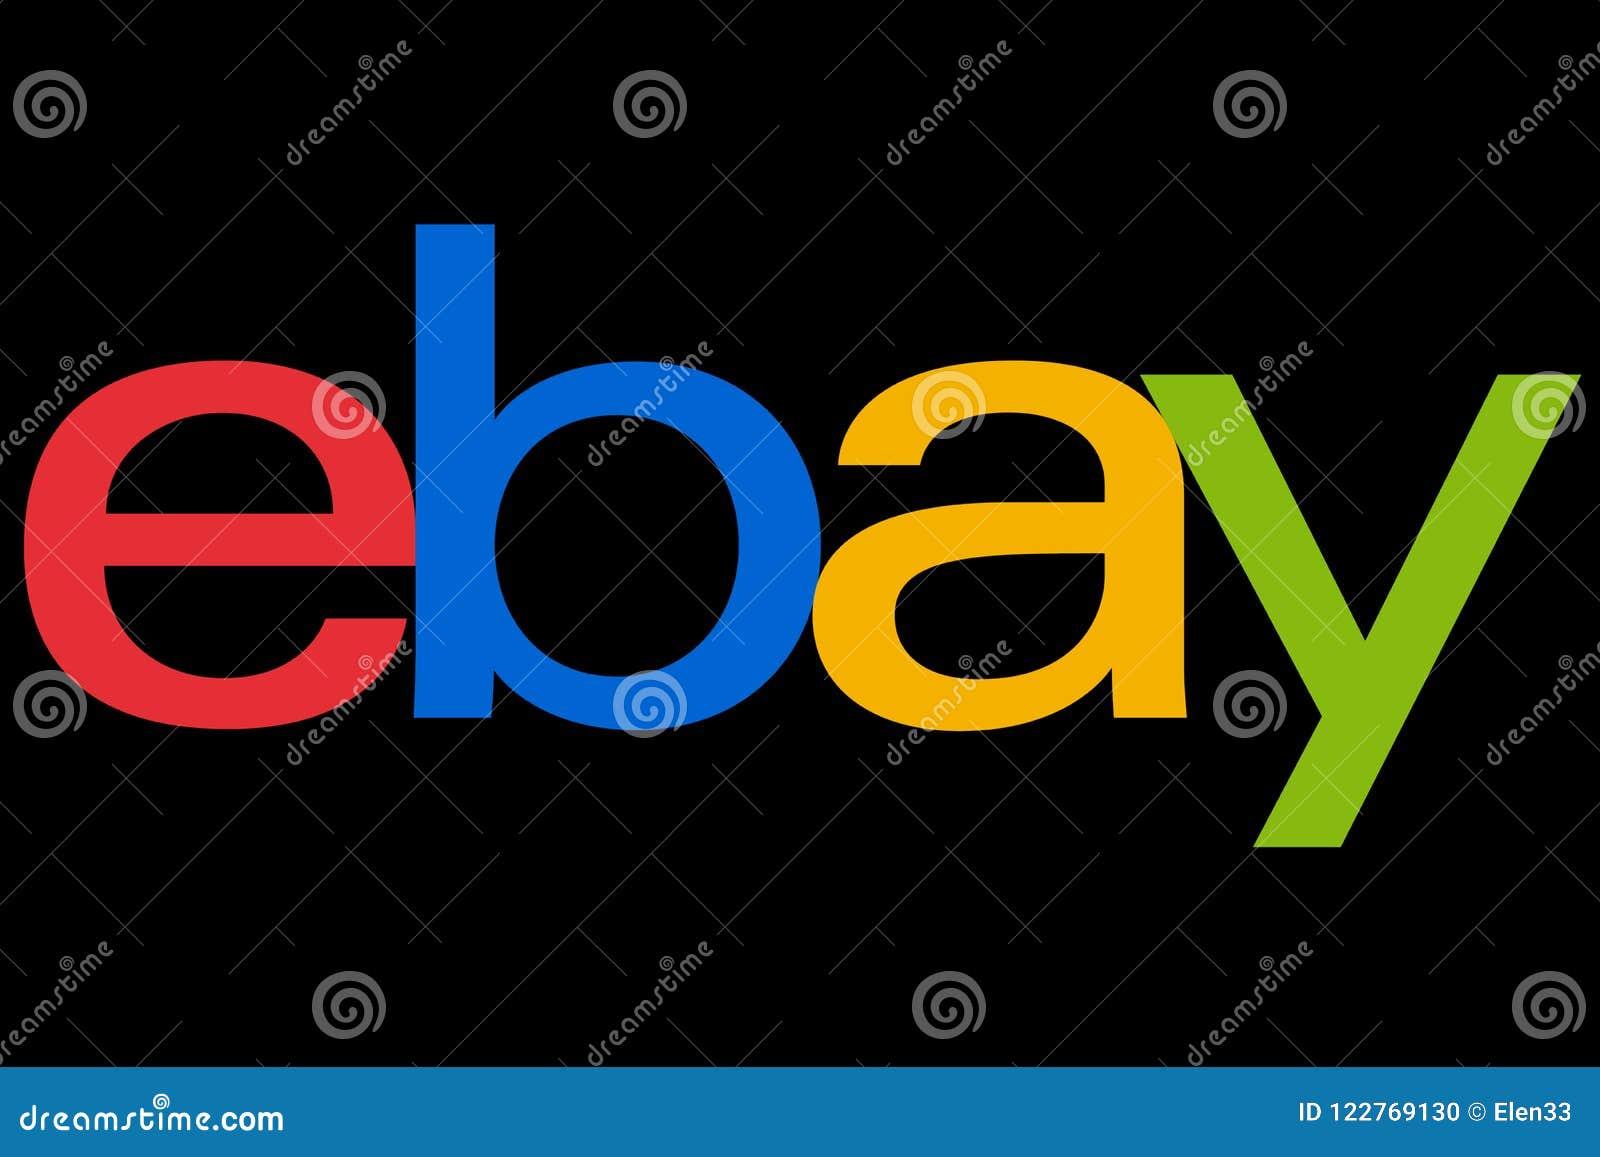 Ebay Logotype Printed On Paper On Black Background Editorial Image Illustration Of Global Advertising 122769130